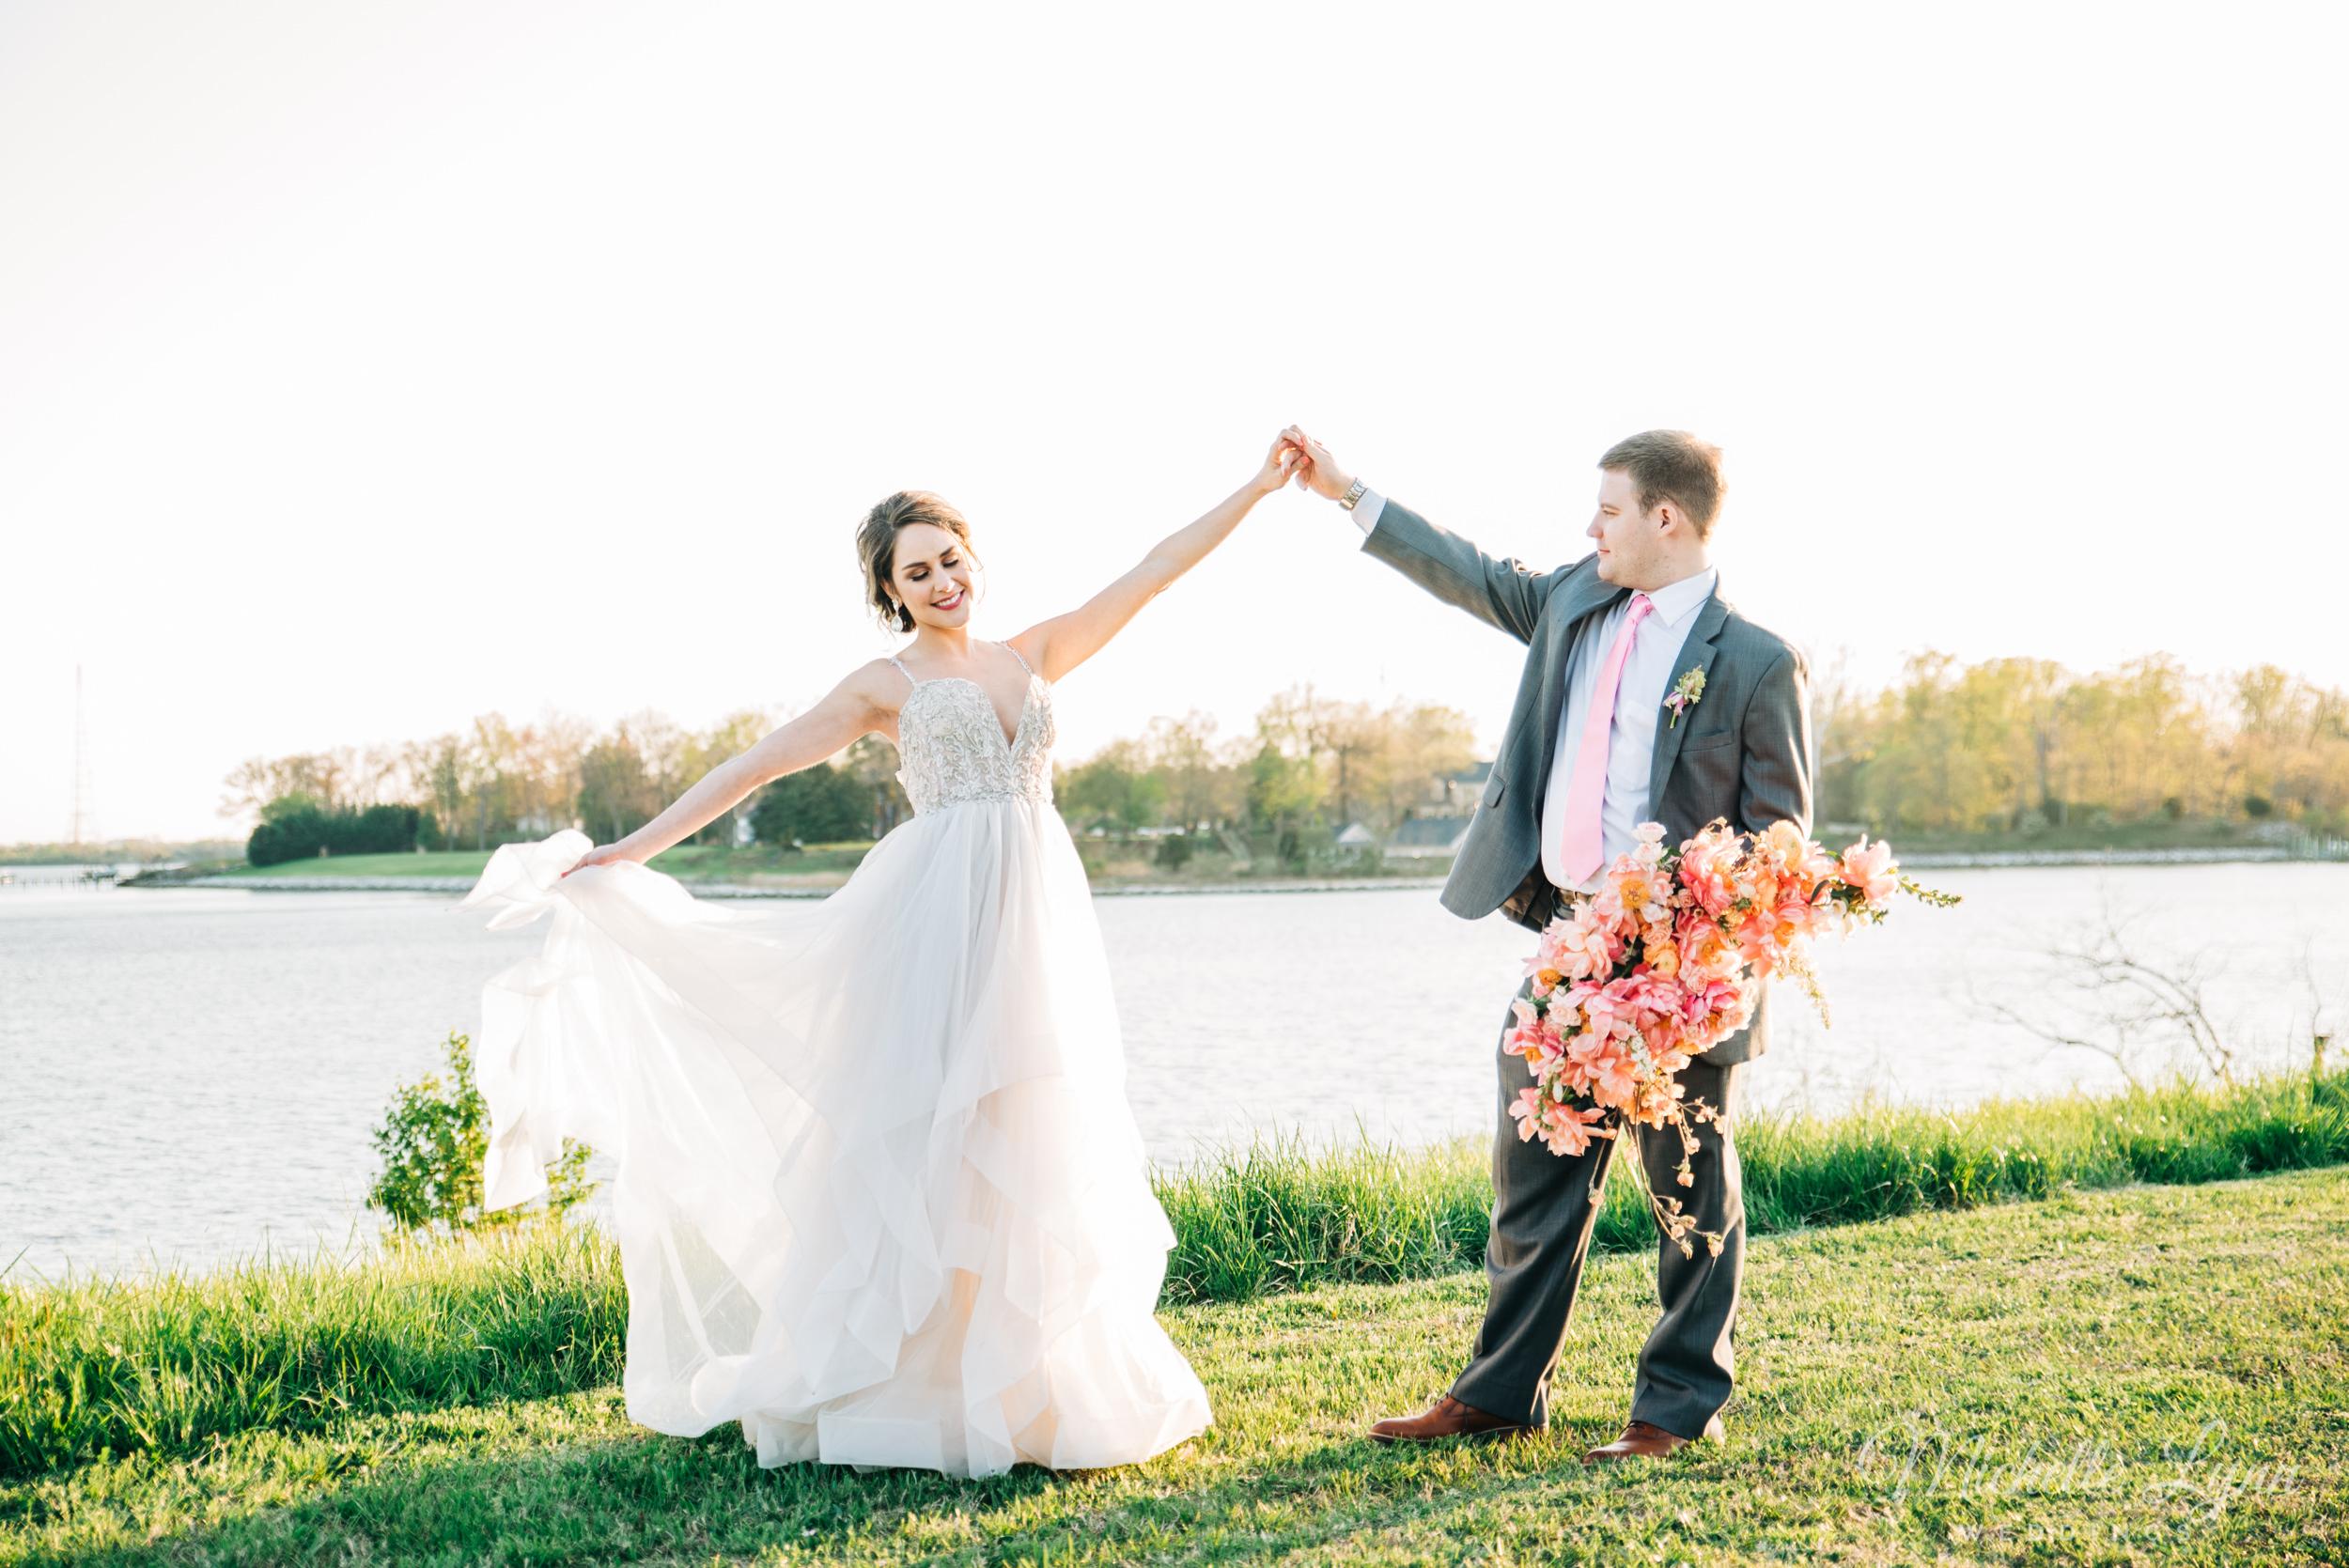 mlw-whitehall-annapolis-maryland-wedding-40.jpg